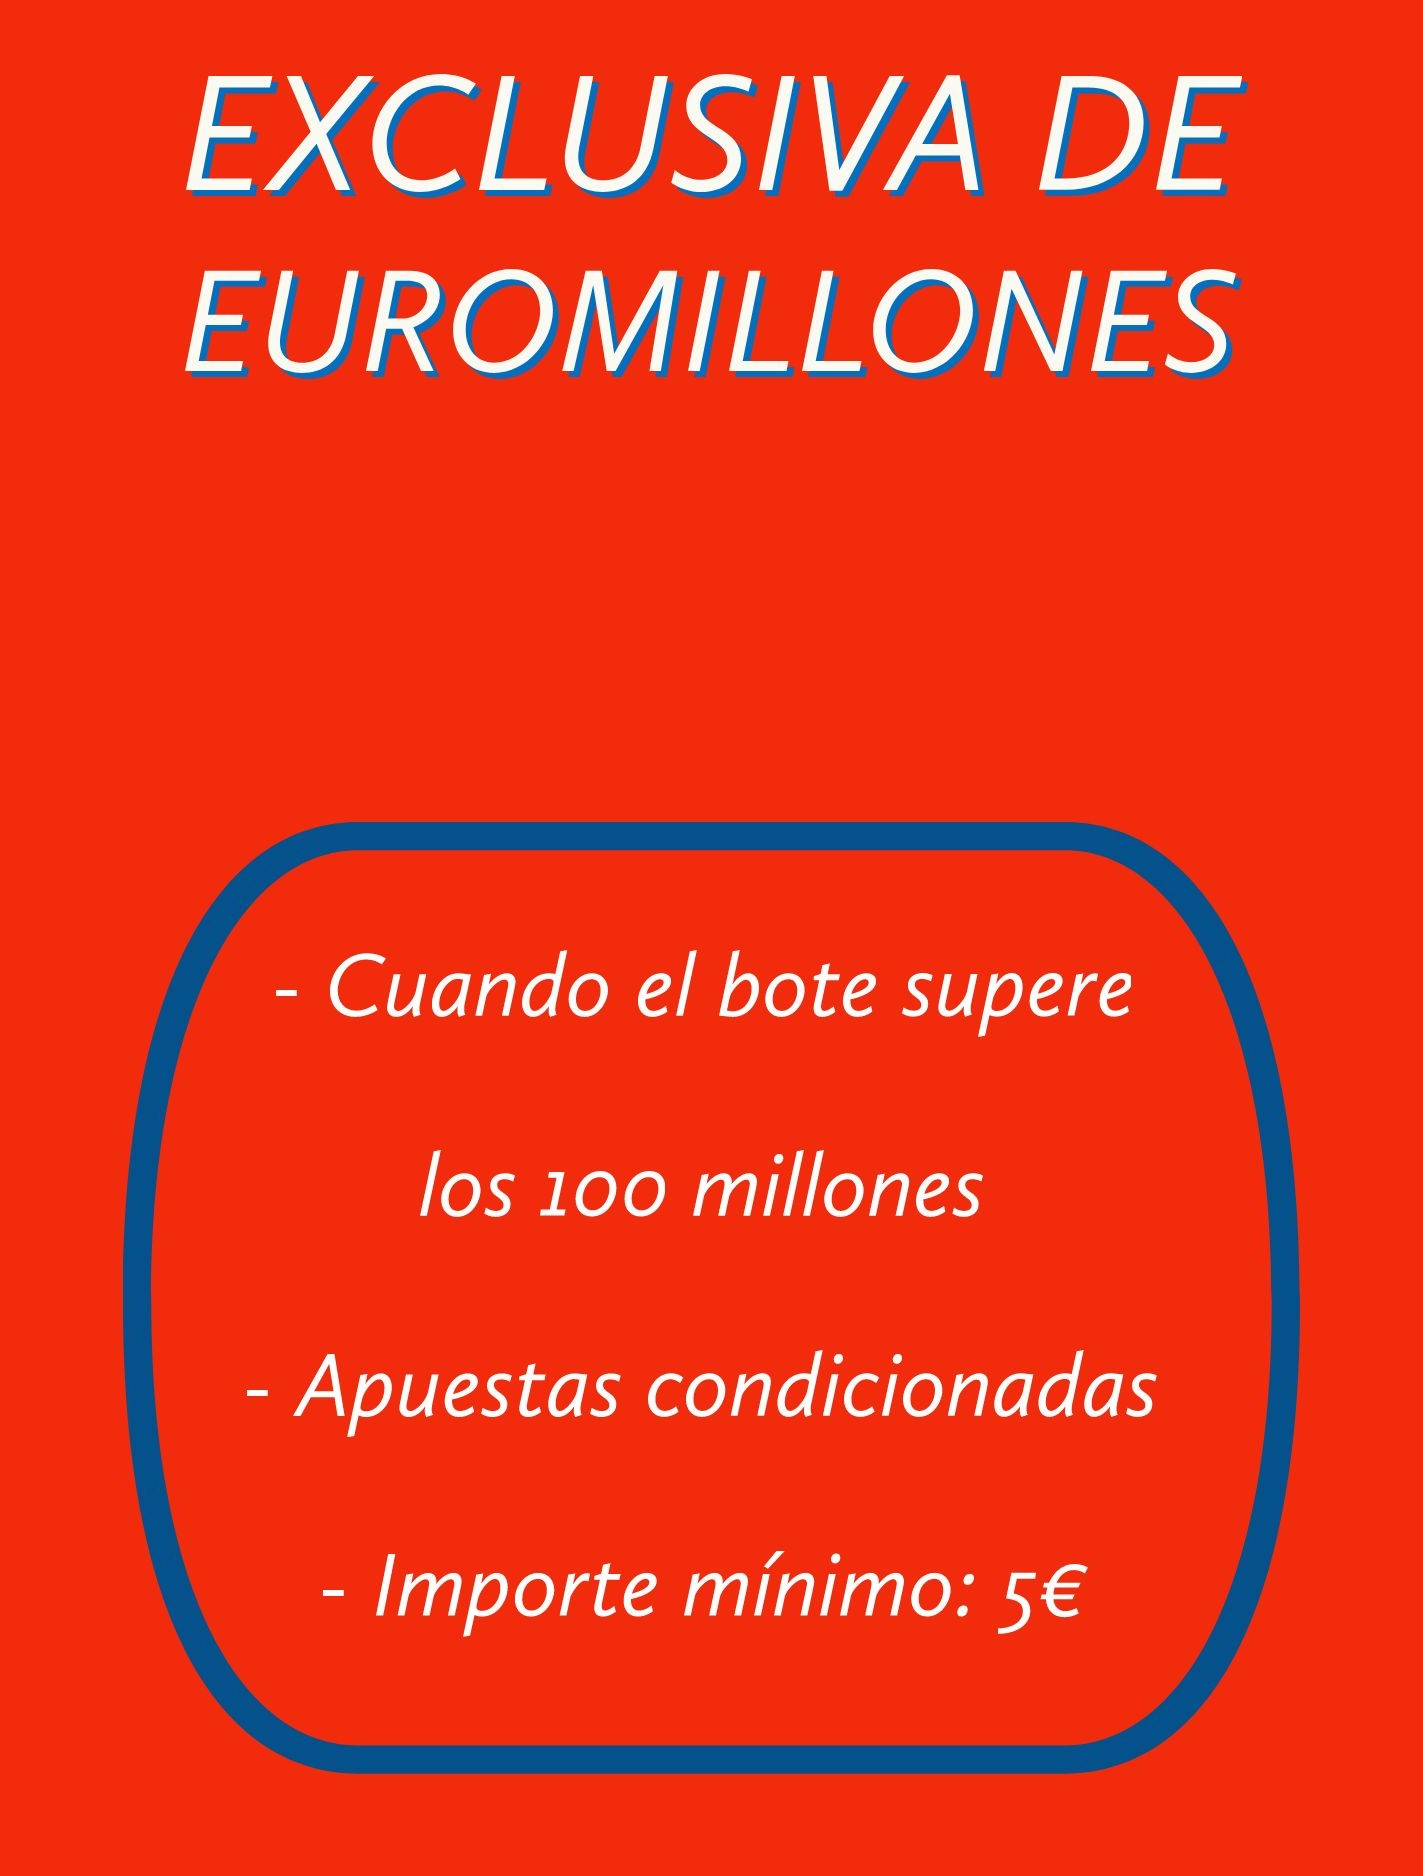 peña-euromillones-valencia-lotería-online-bote-euromillones-exclusiva-euromillones